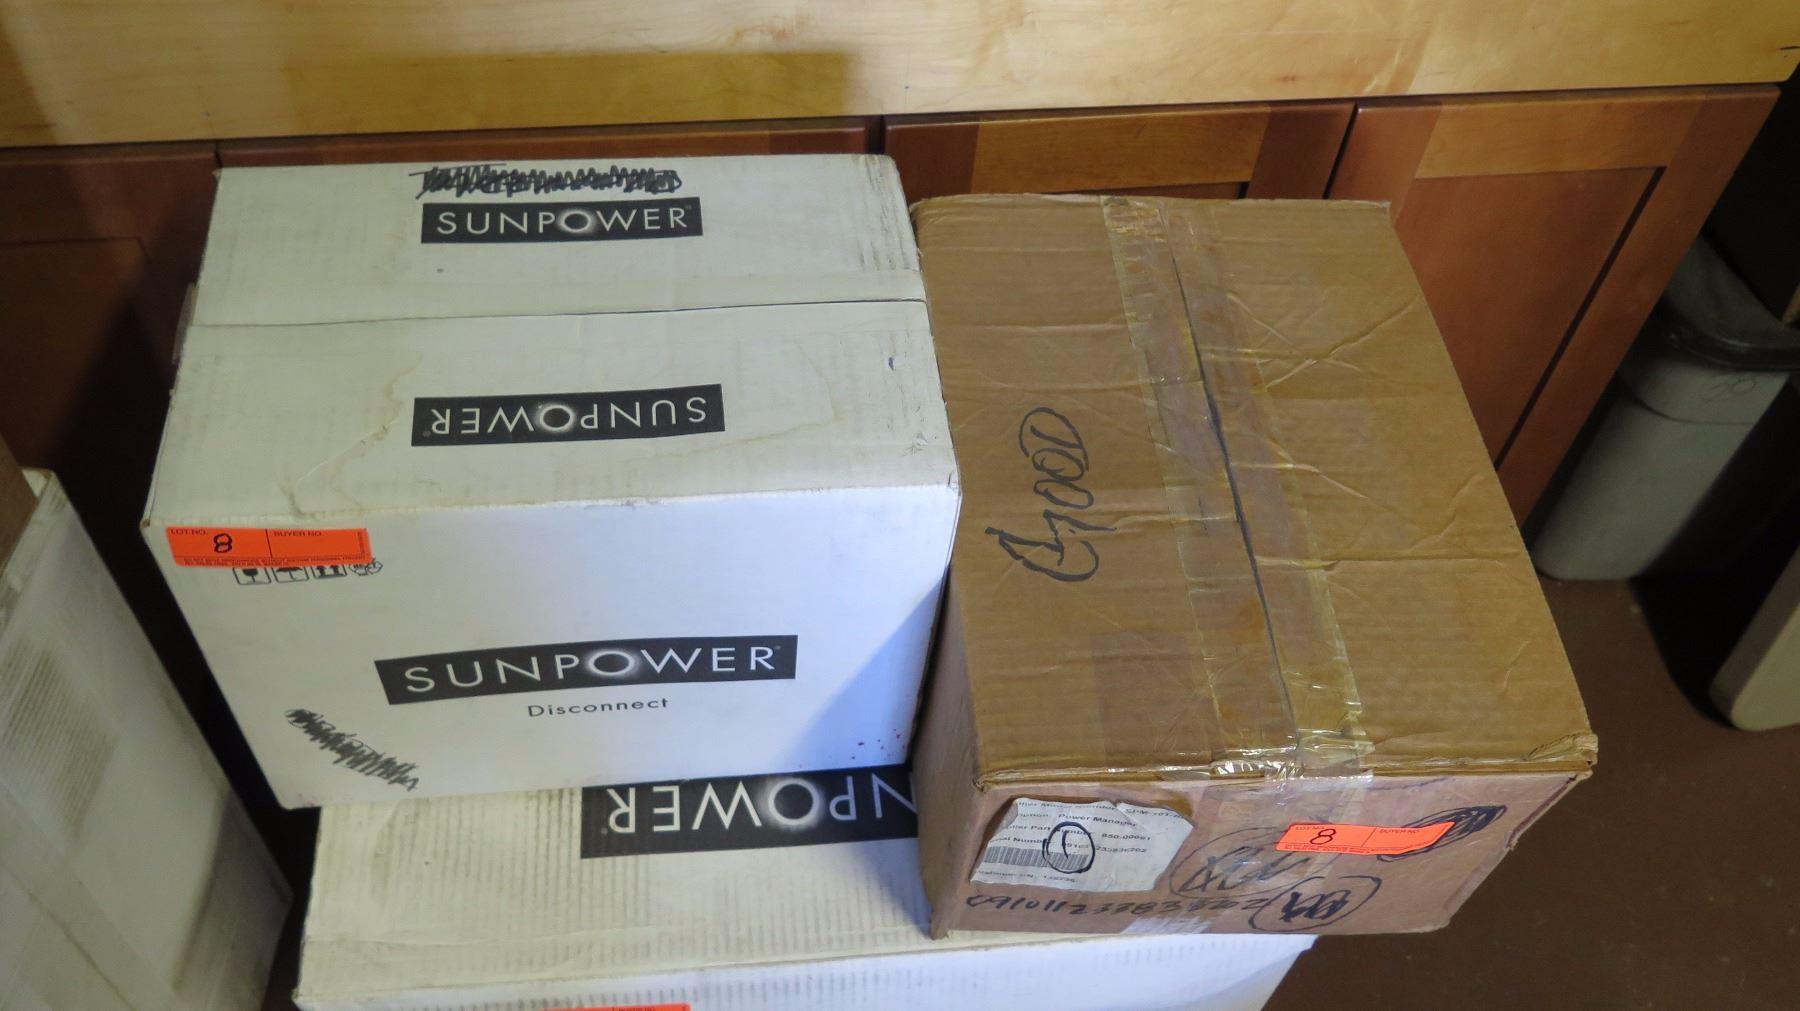 New Sunpower SPR 4000M Inverter, Sunpower SPR-DC-DIS2TL-M-US